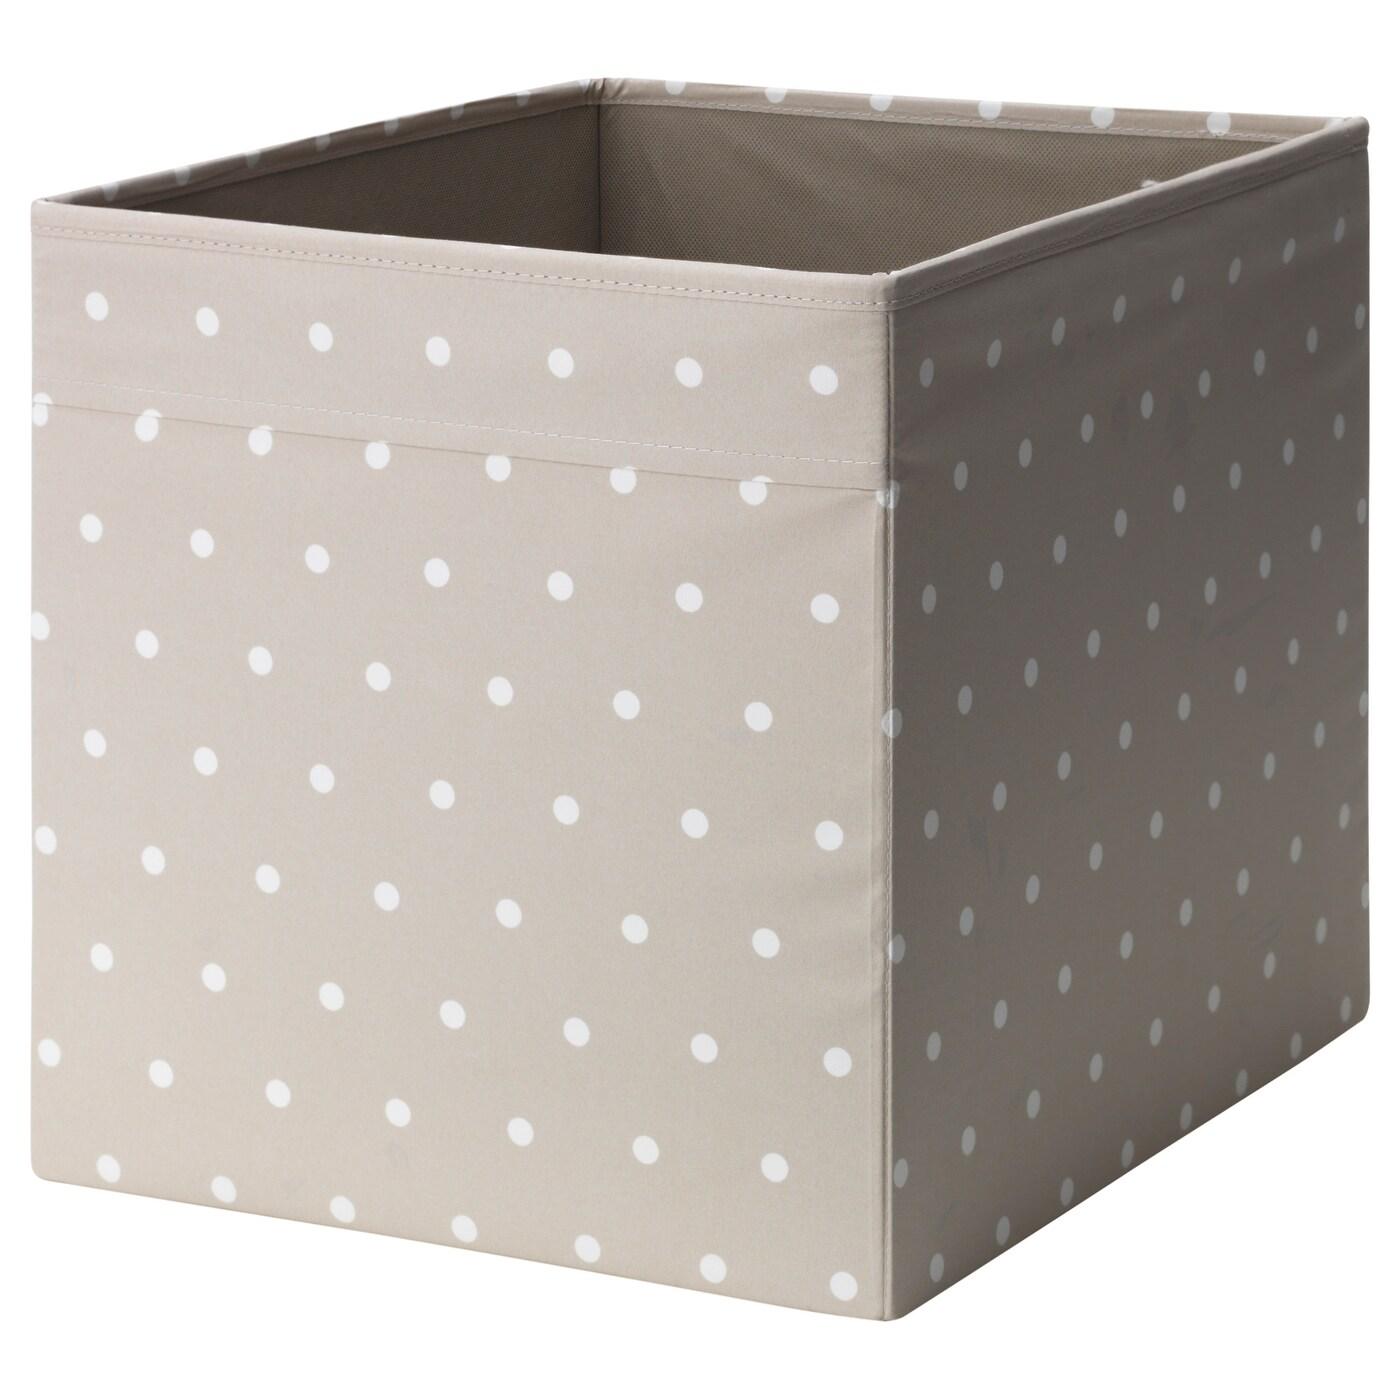 IKEA DRÖNA Caja Ideal Para Guardar De Todo, Desde Periódicos Hasta Ropa.